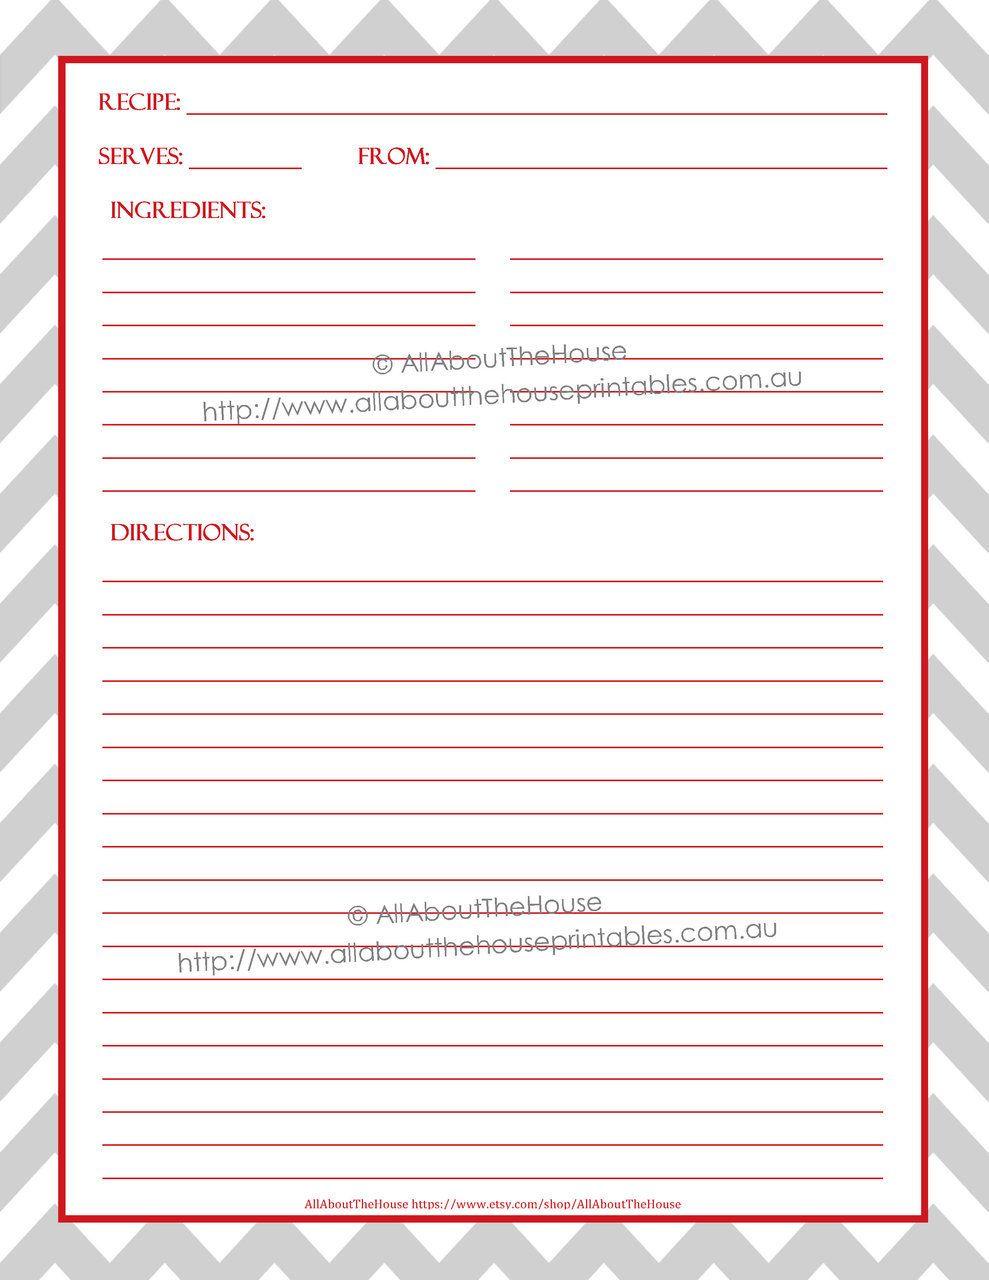 Full Page Recipe Templates Binder Free Editable Recipe Card